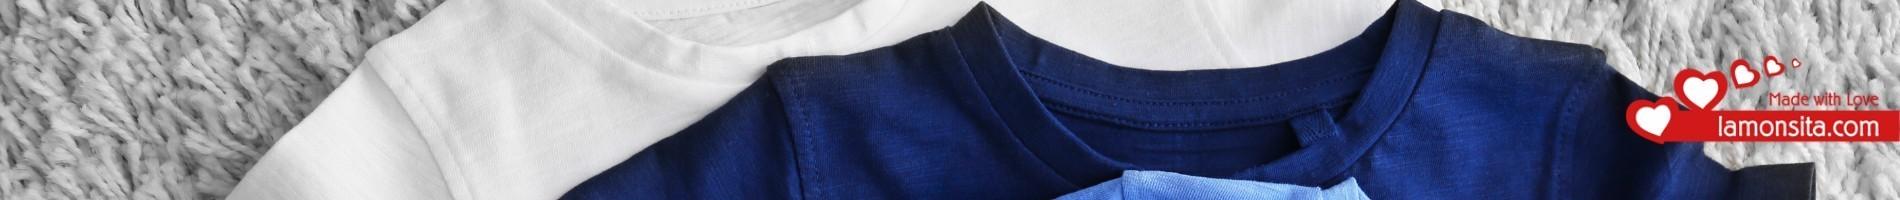 Camisetas de mujer de algodón natural 100%| lamonsita.com